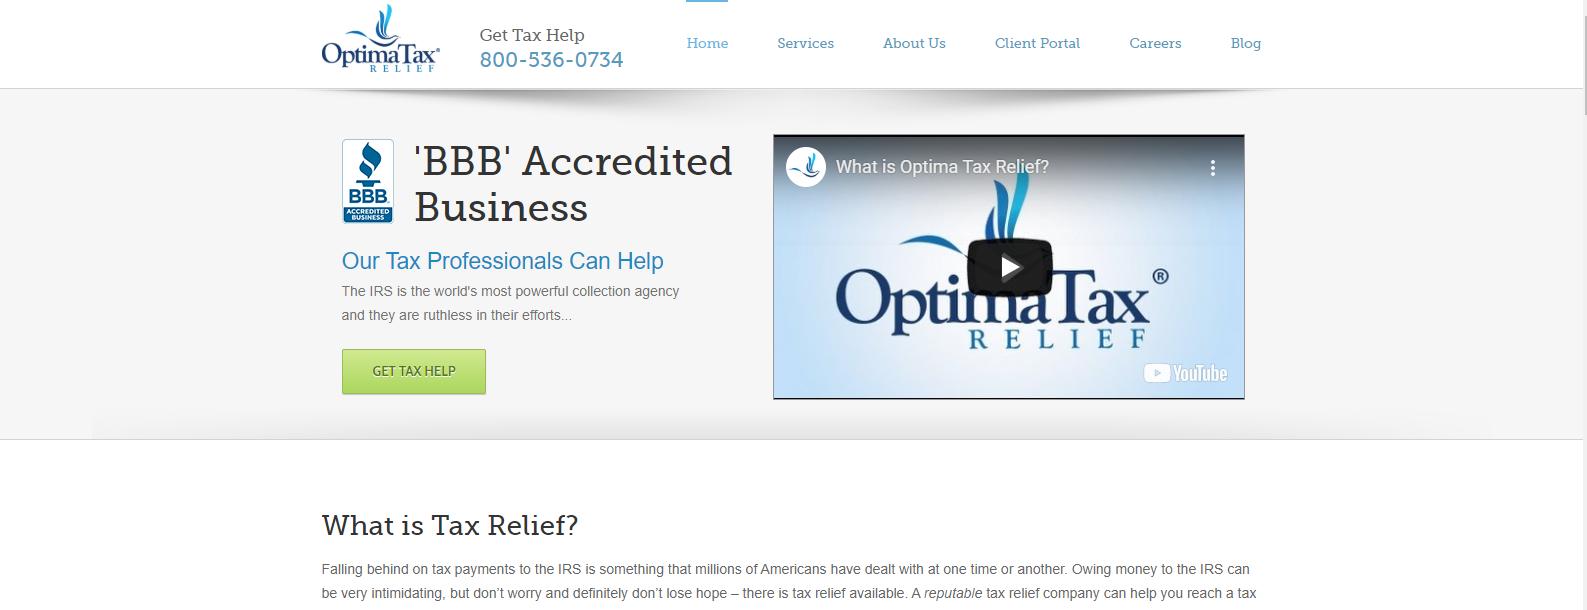 optima tax home page